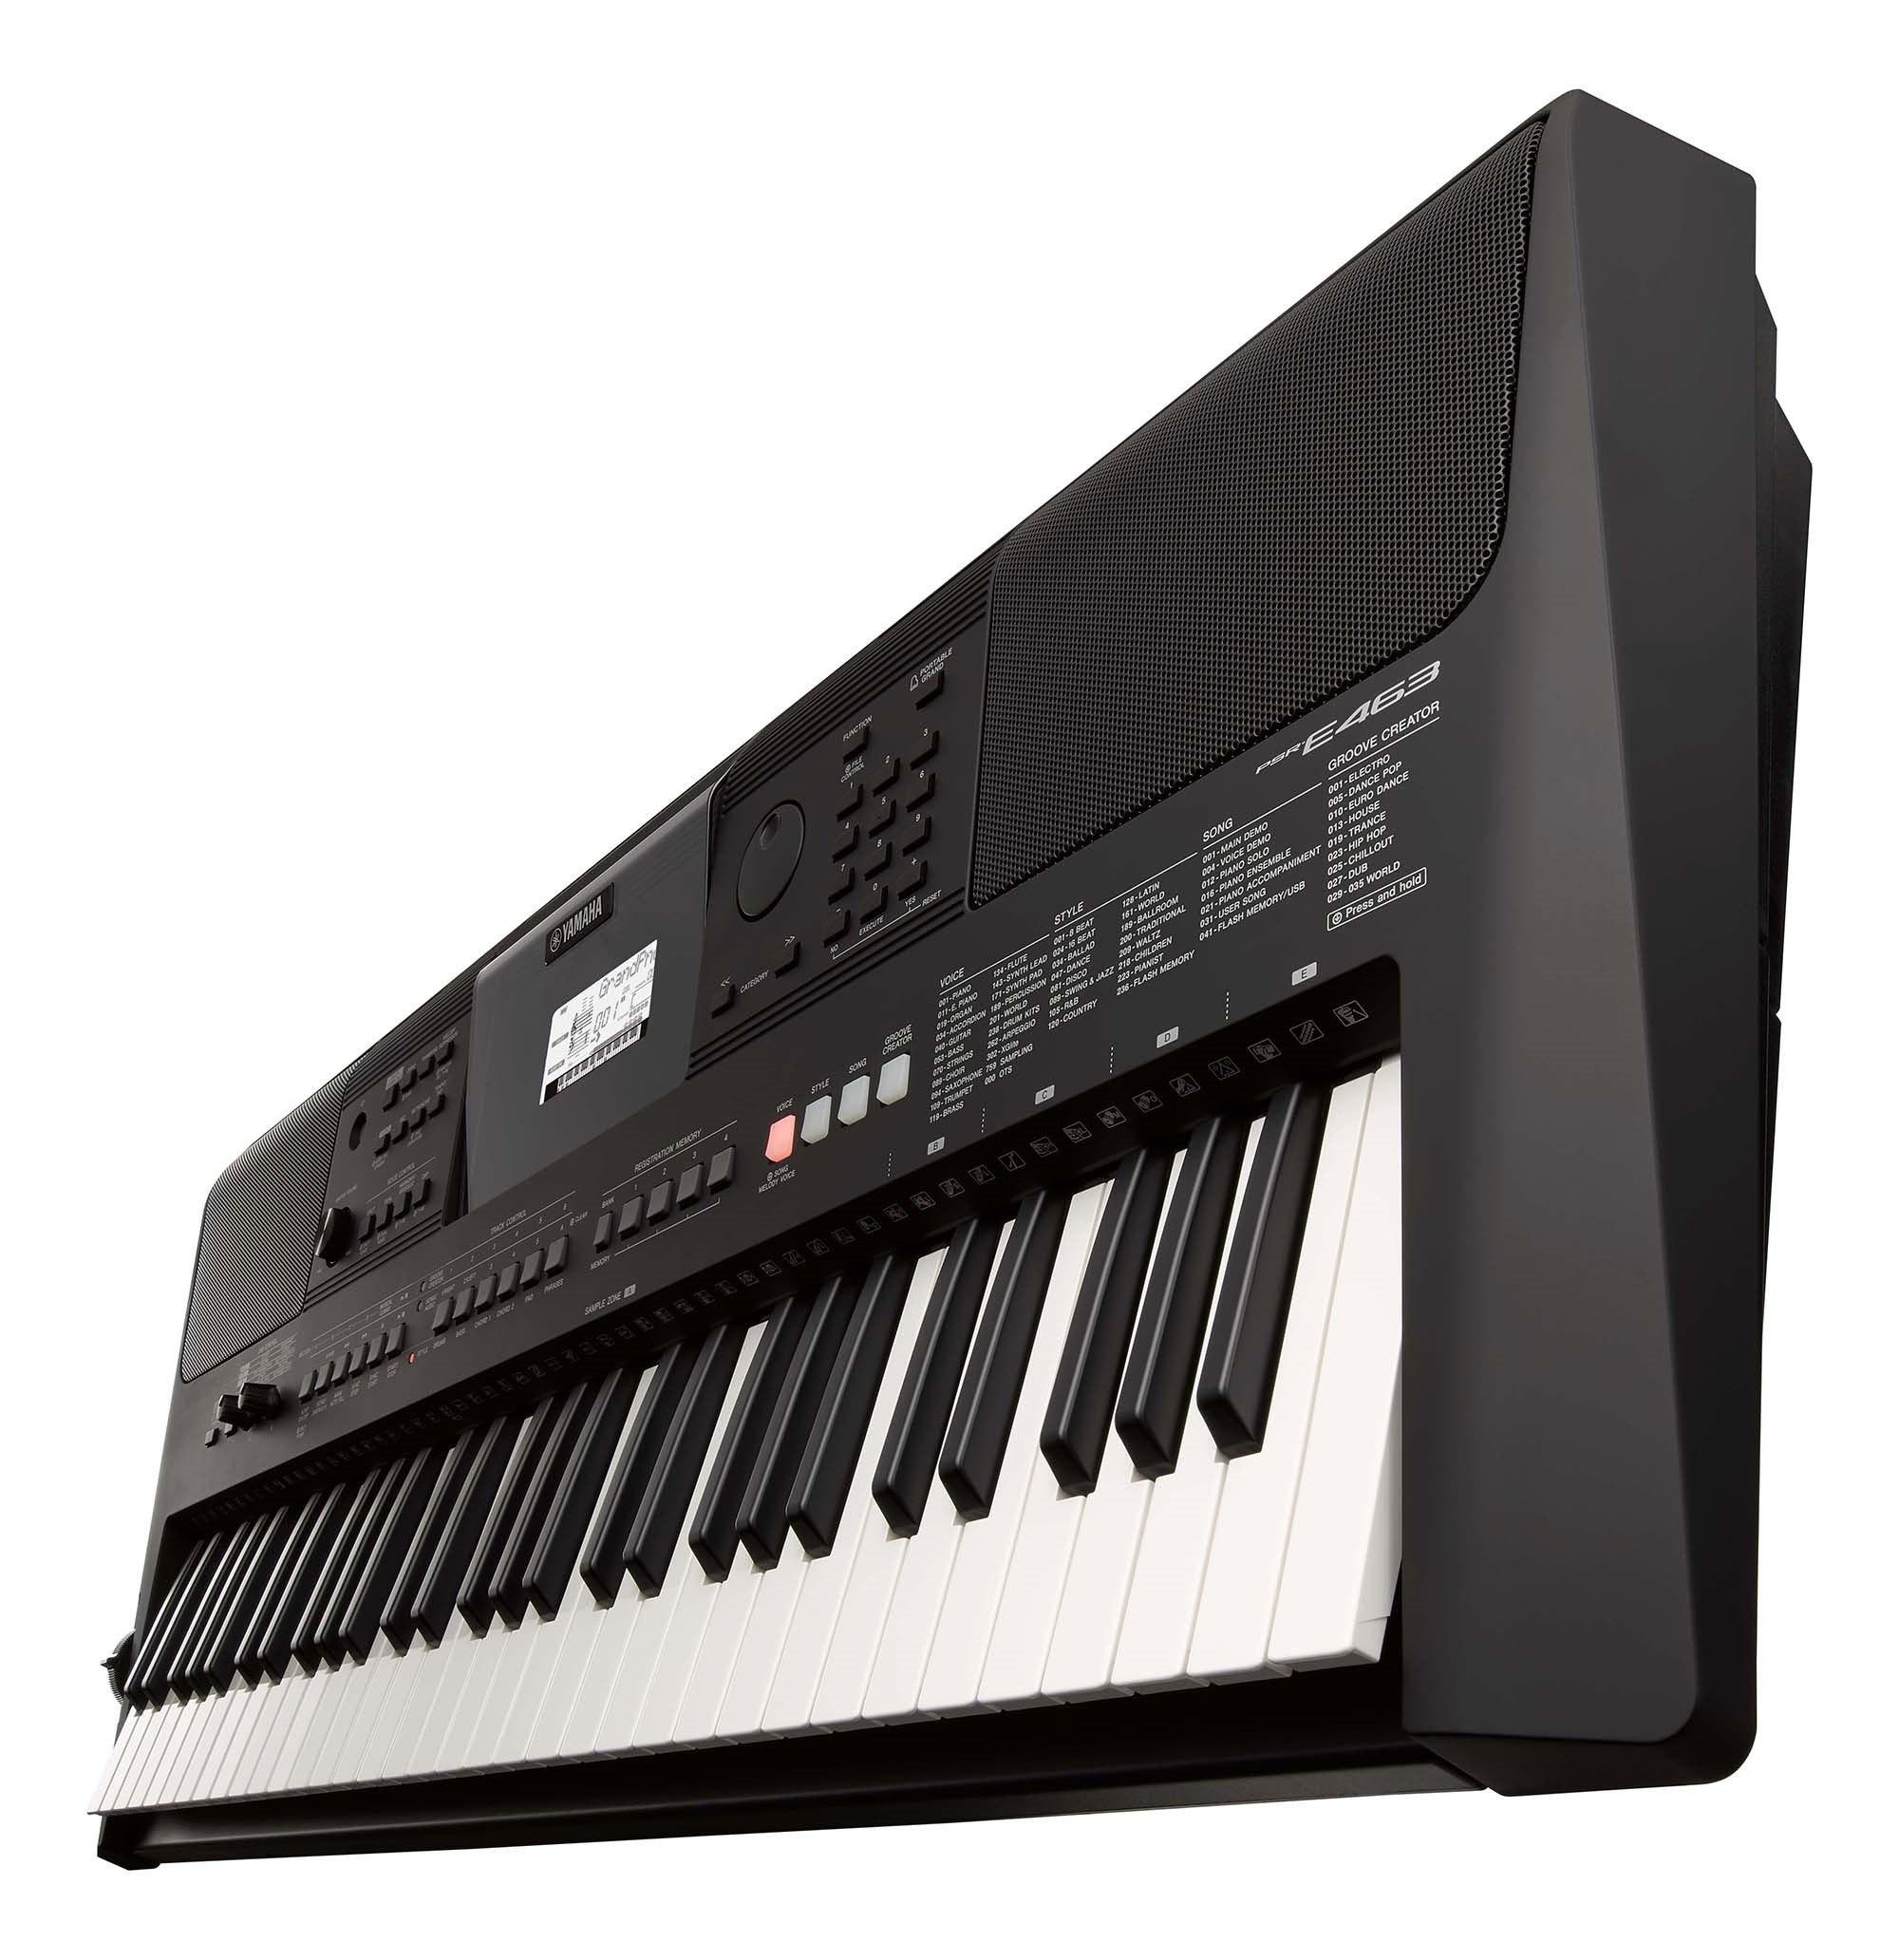 Yamaha PSRE463 61-Key Portable Keyboard | Full Compass Systems